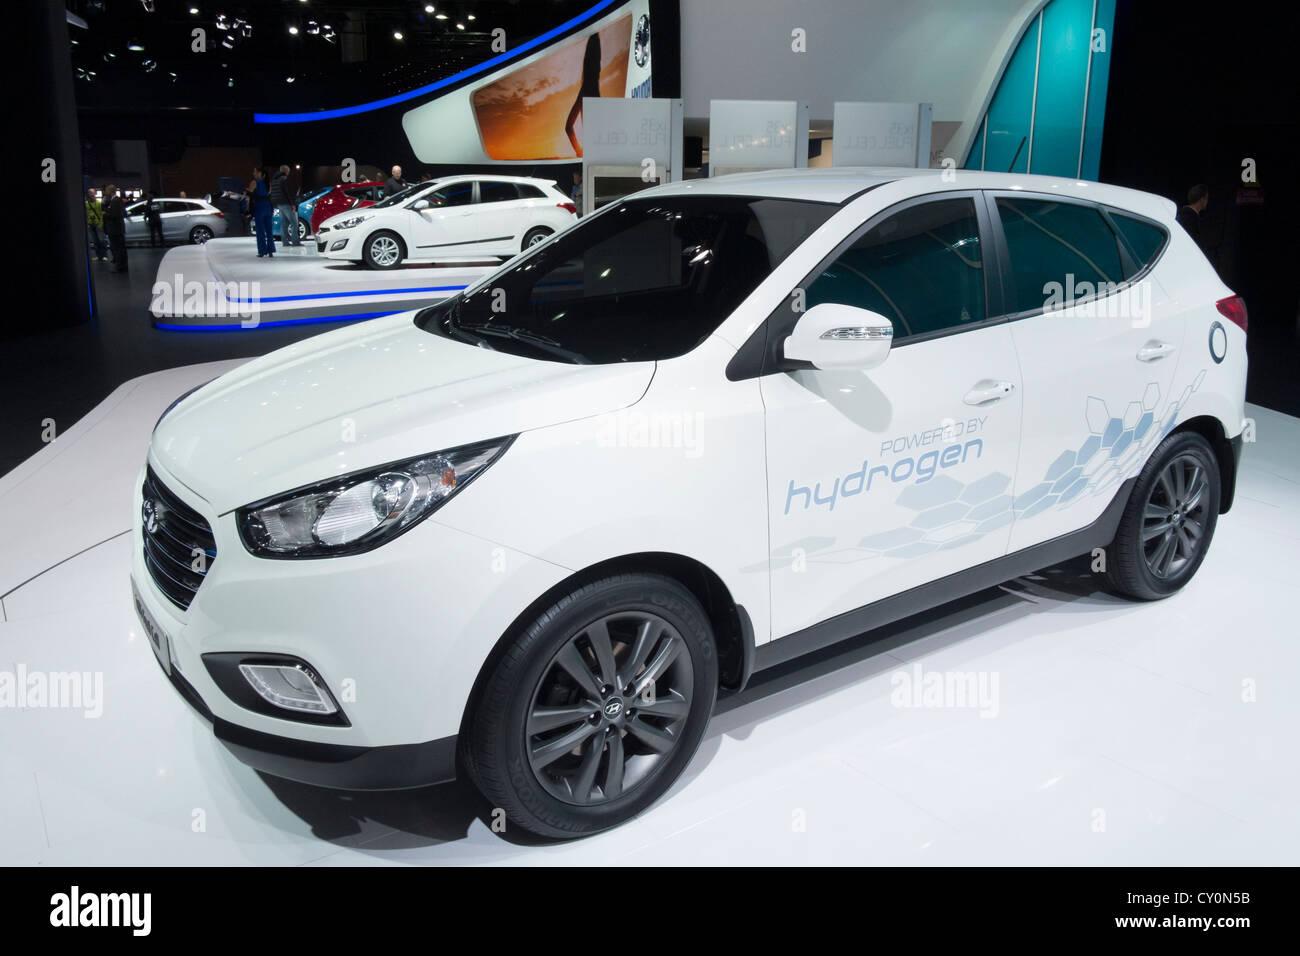 hydrogen fuel cell concept  Hyundai ix35 car at Paris Motor Show 2012 - Stock Image